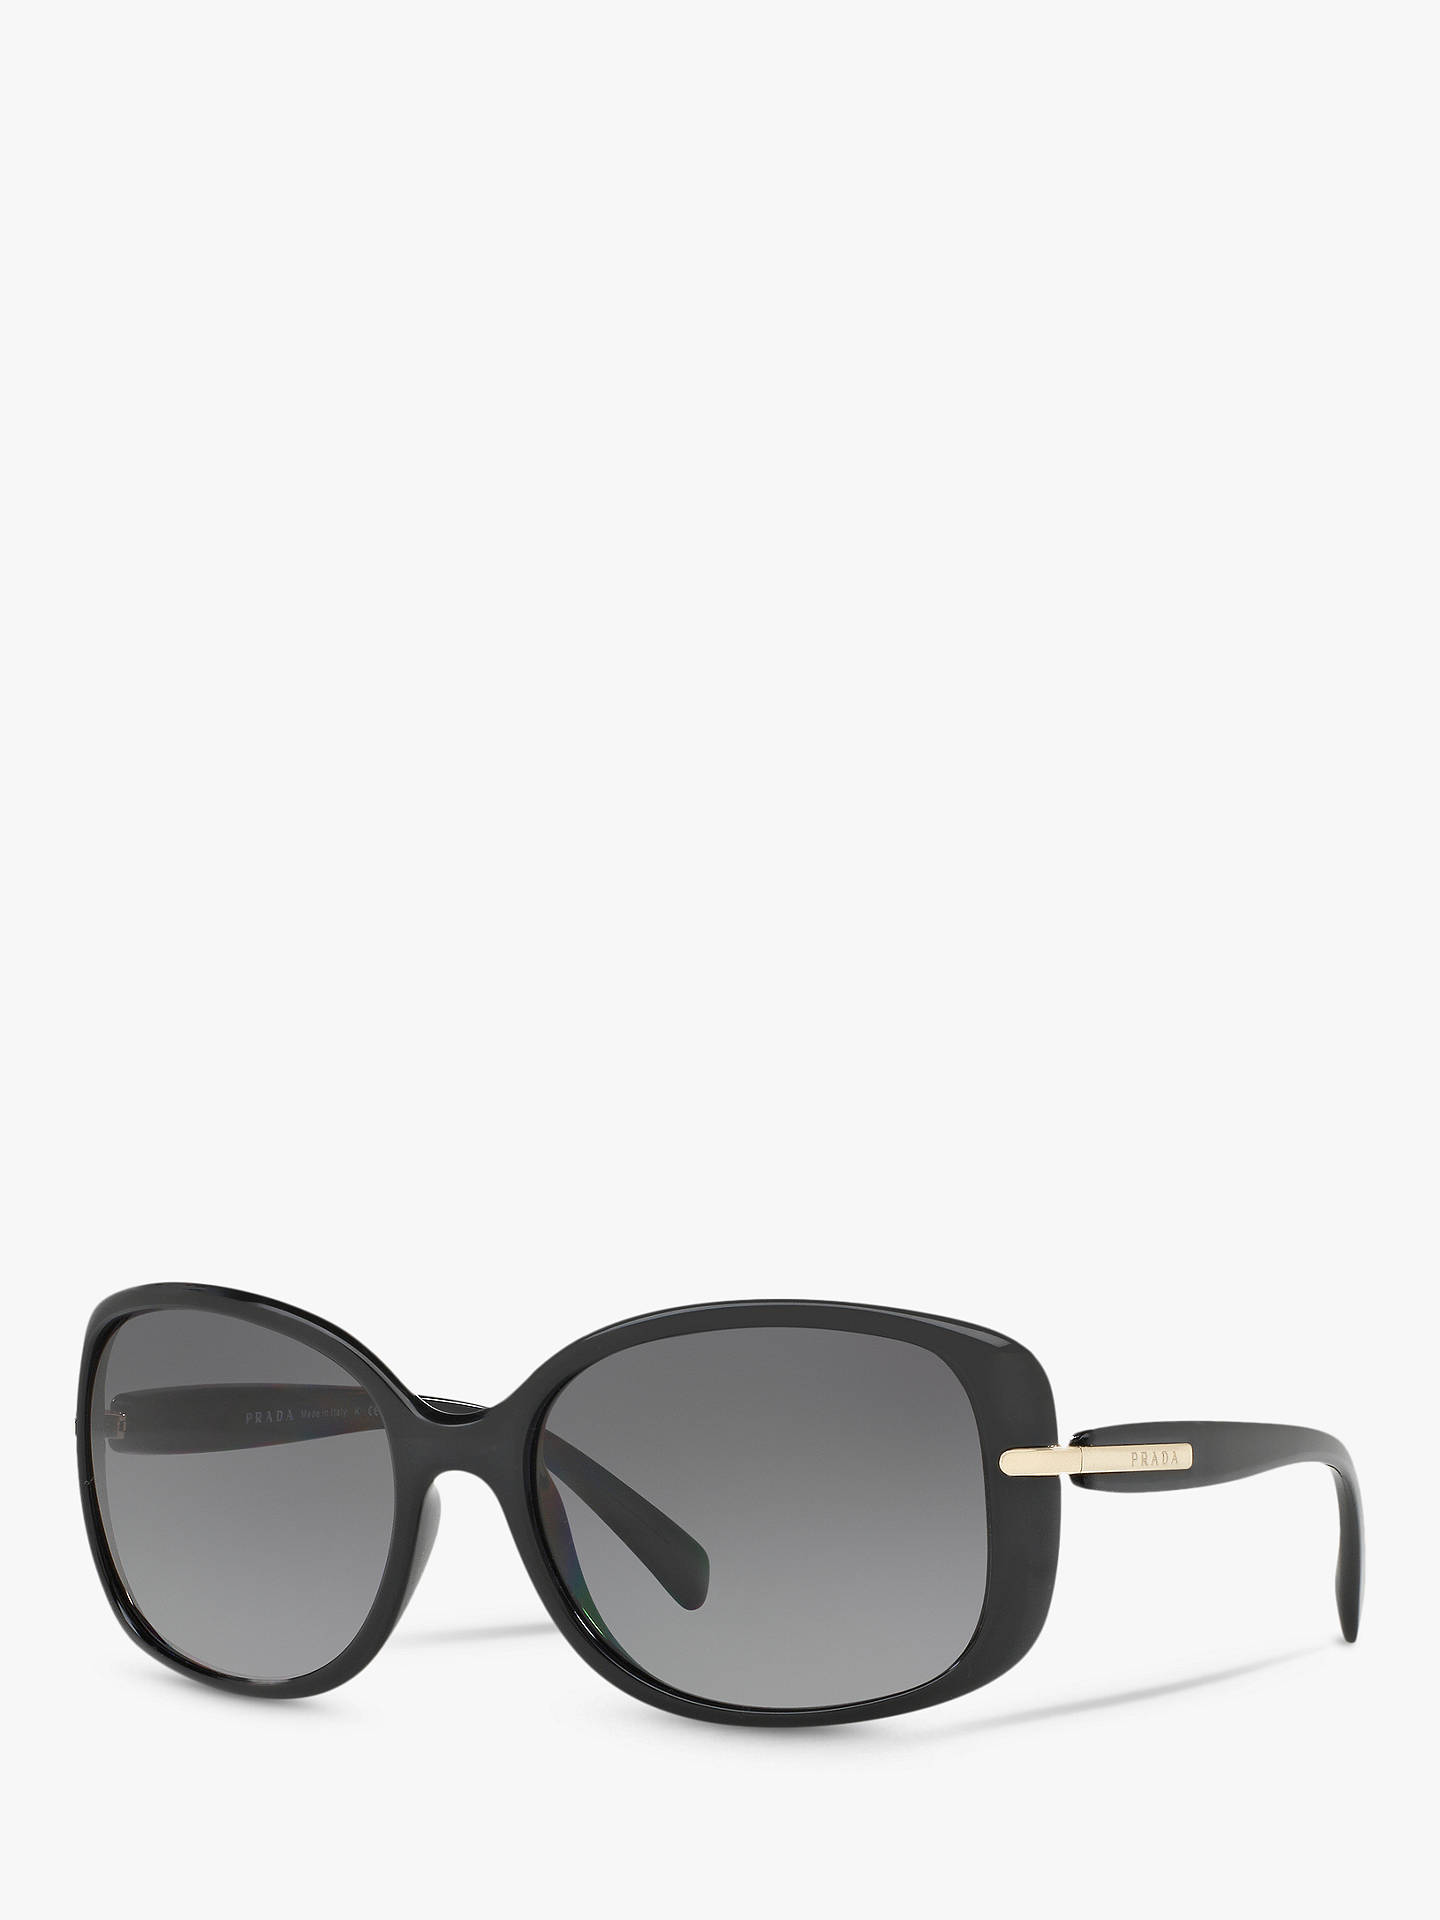 dc1bfa608858 Buy Prada PR 08OS Women's Polarised Rectangular Sunglasses, Black/Grey  Gradient Online at johnlewis ...